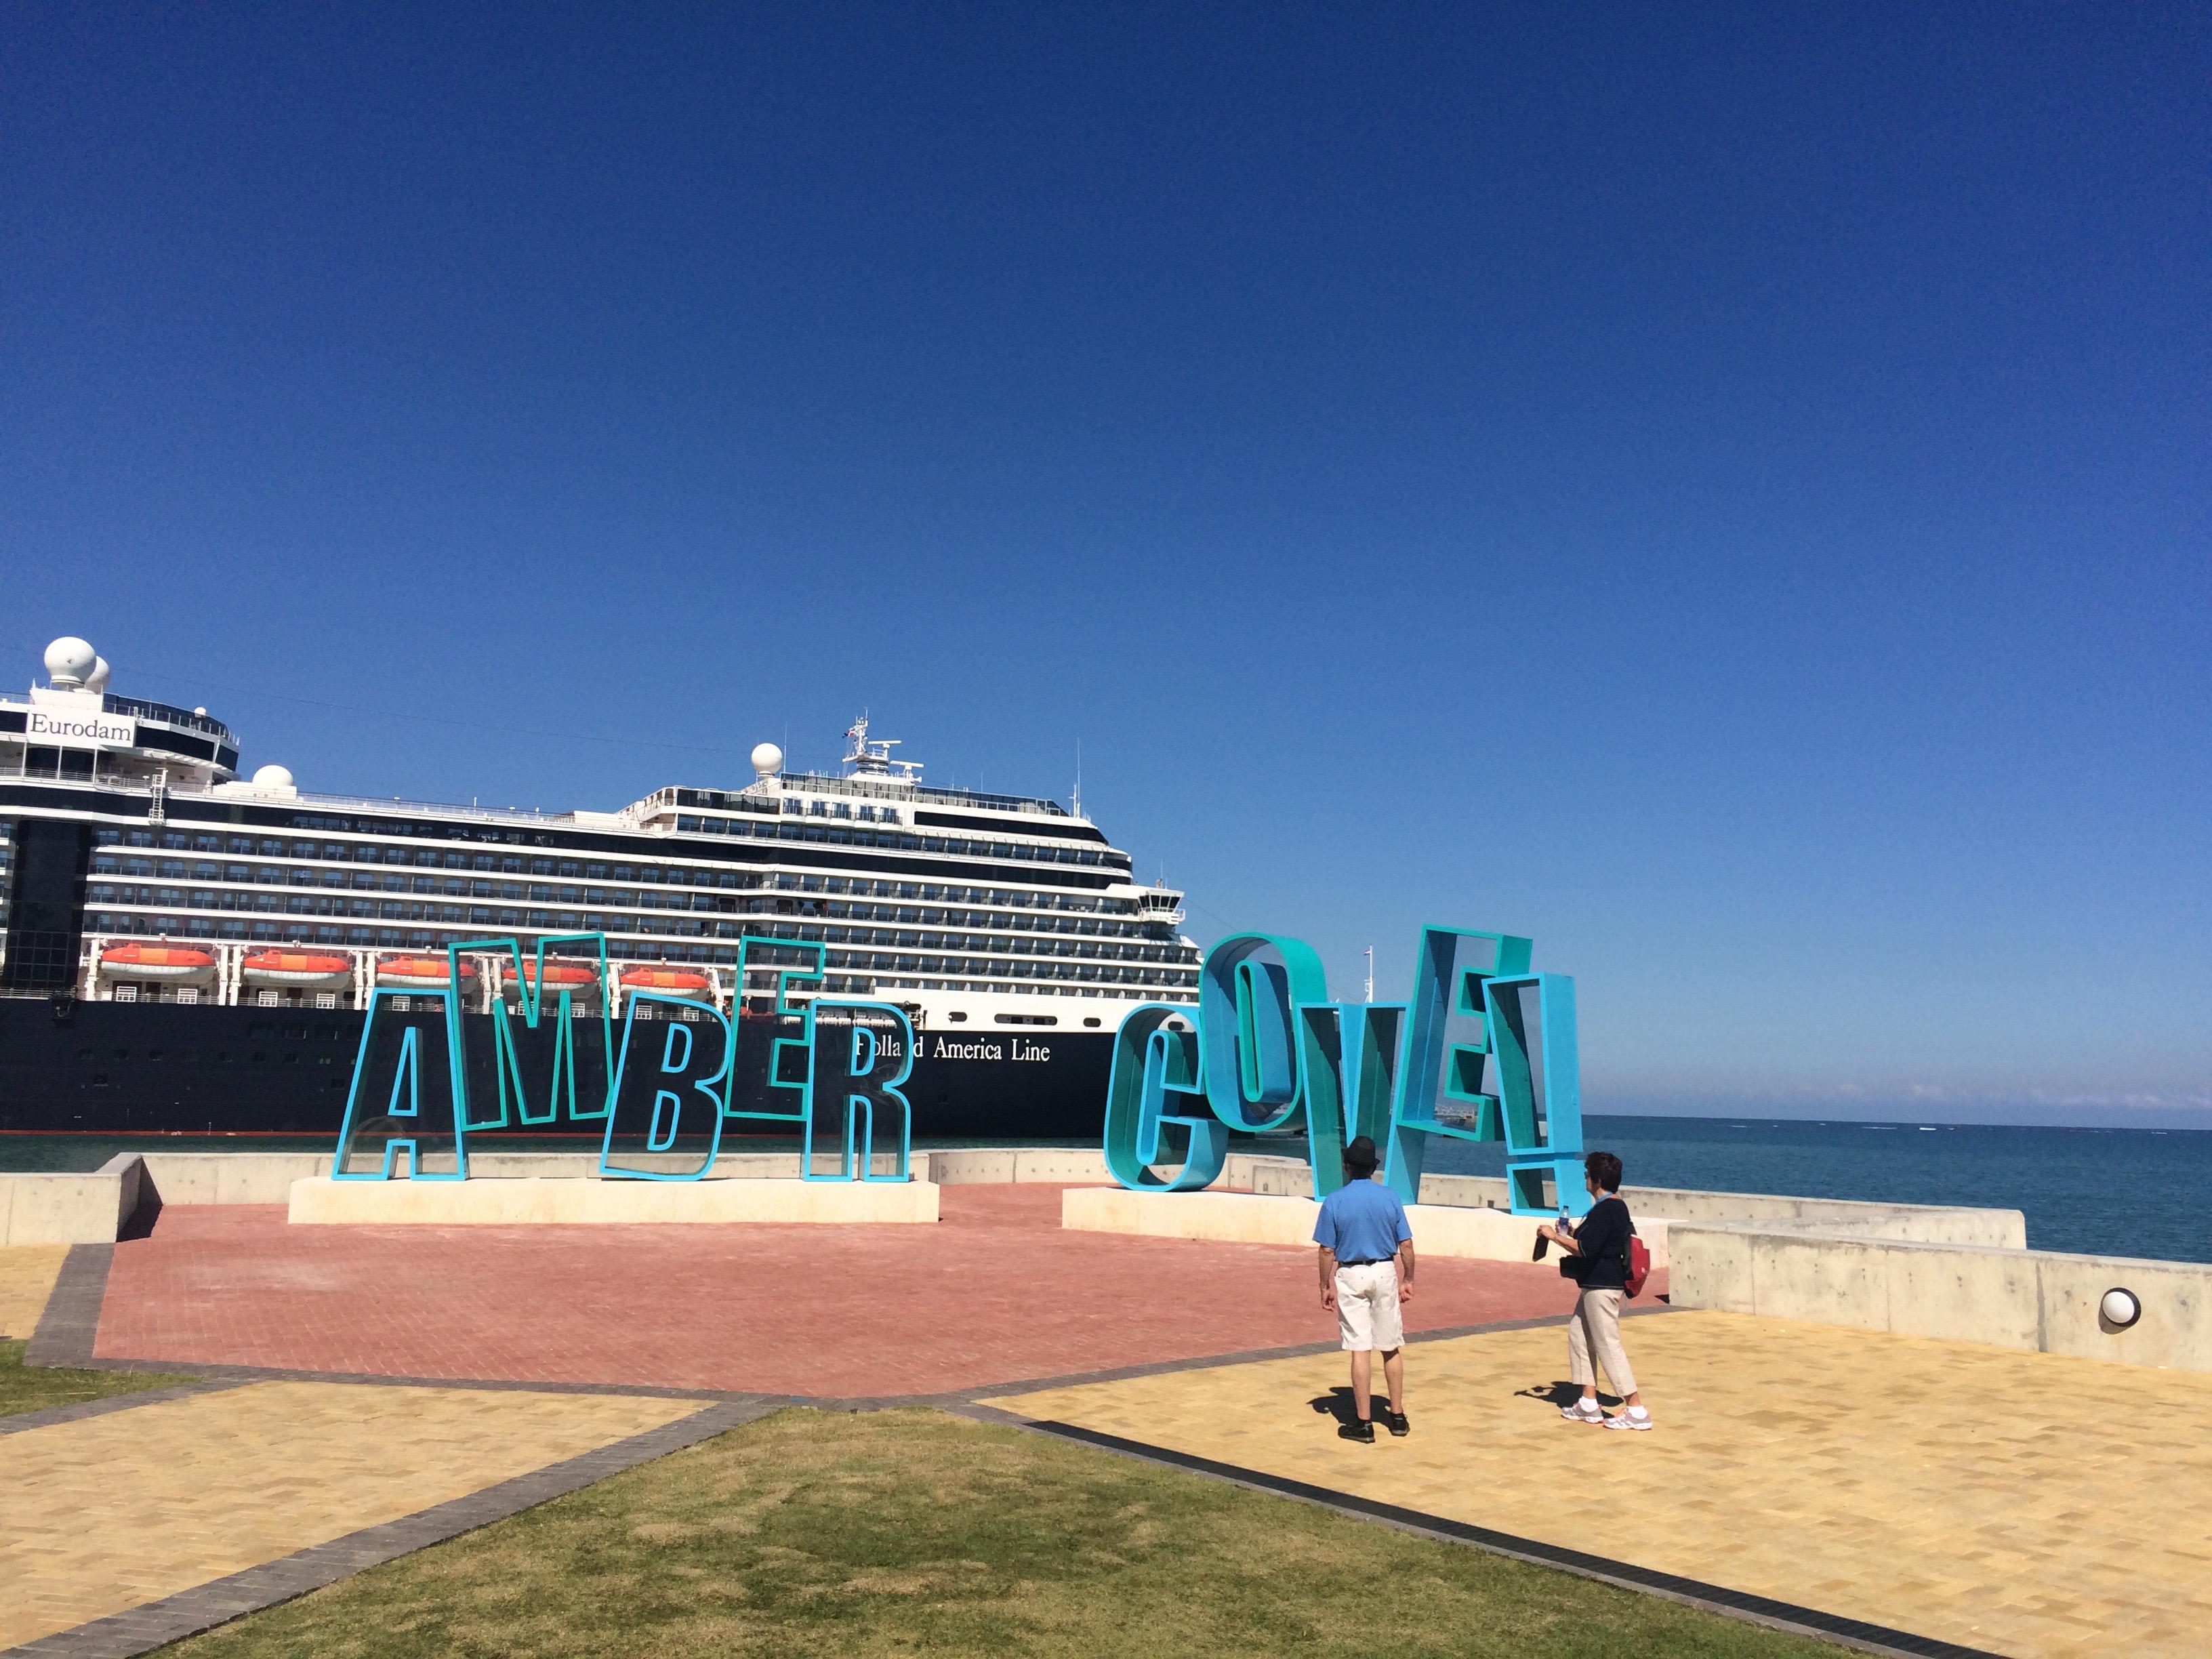 「The Jazz Cruise」カリブ海の船上ジャズフェスティバル(後編)